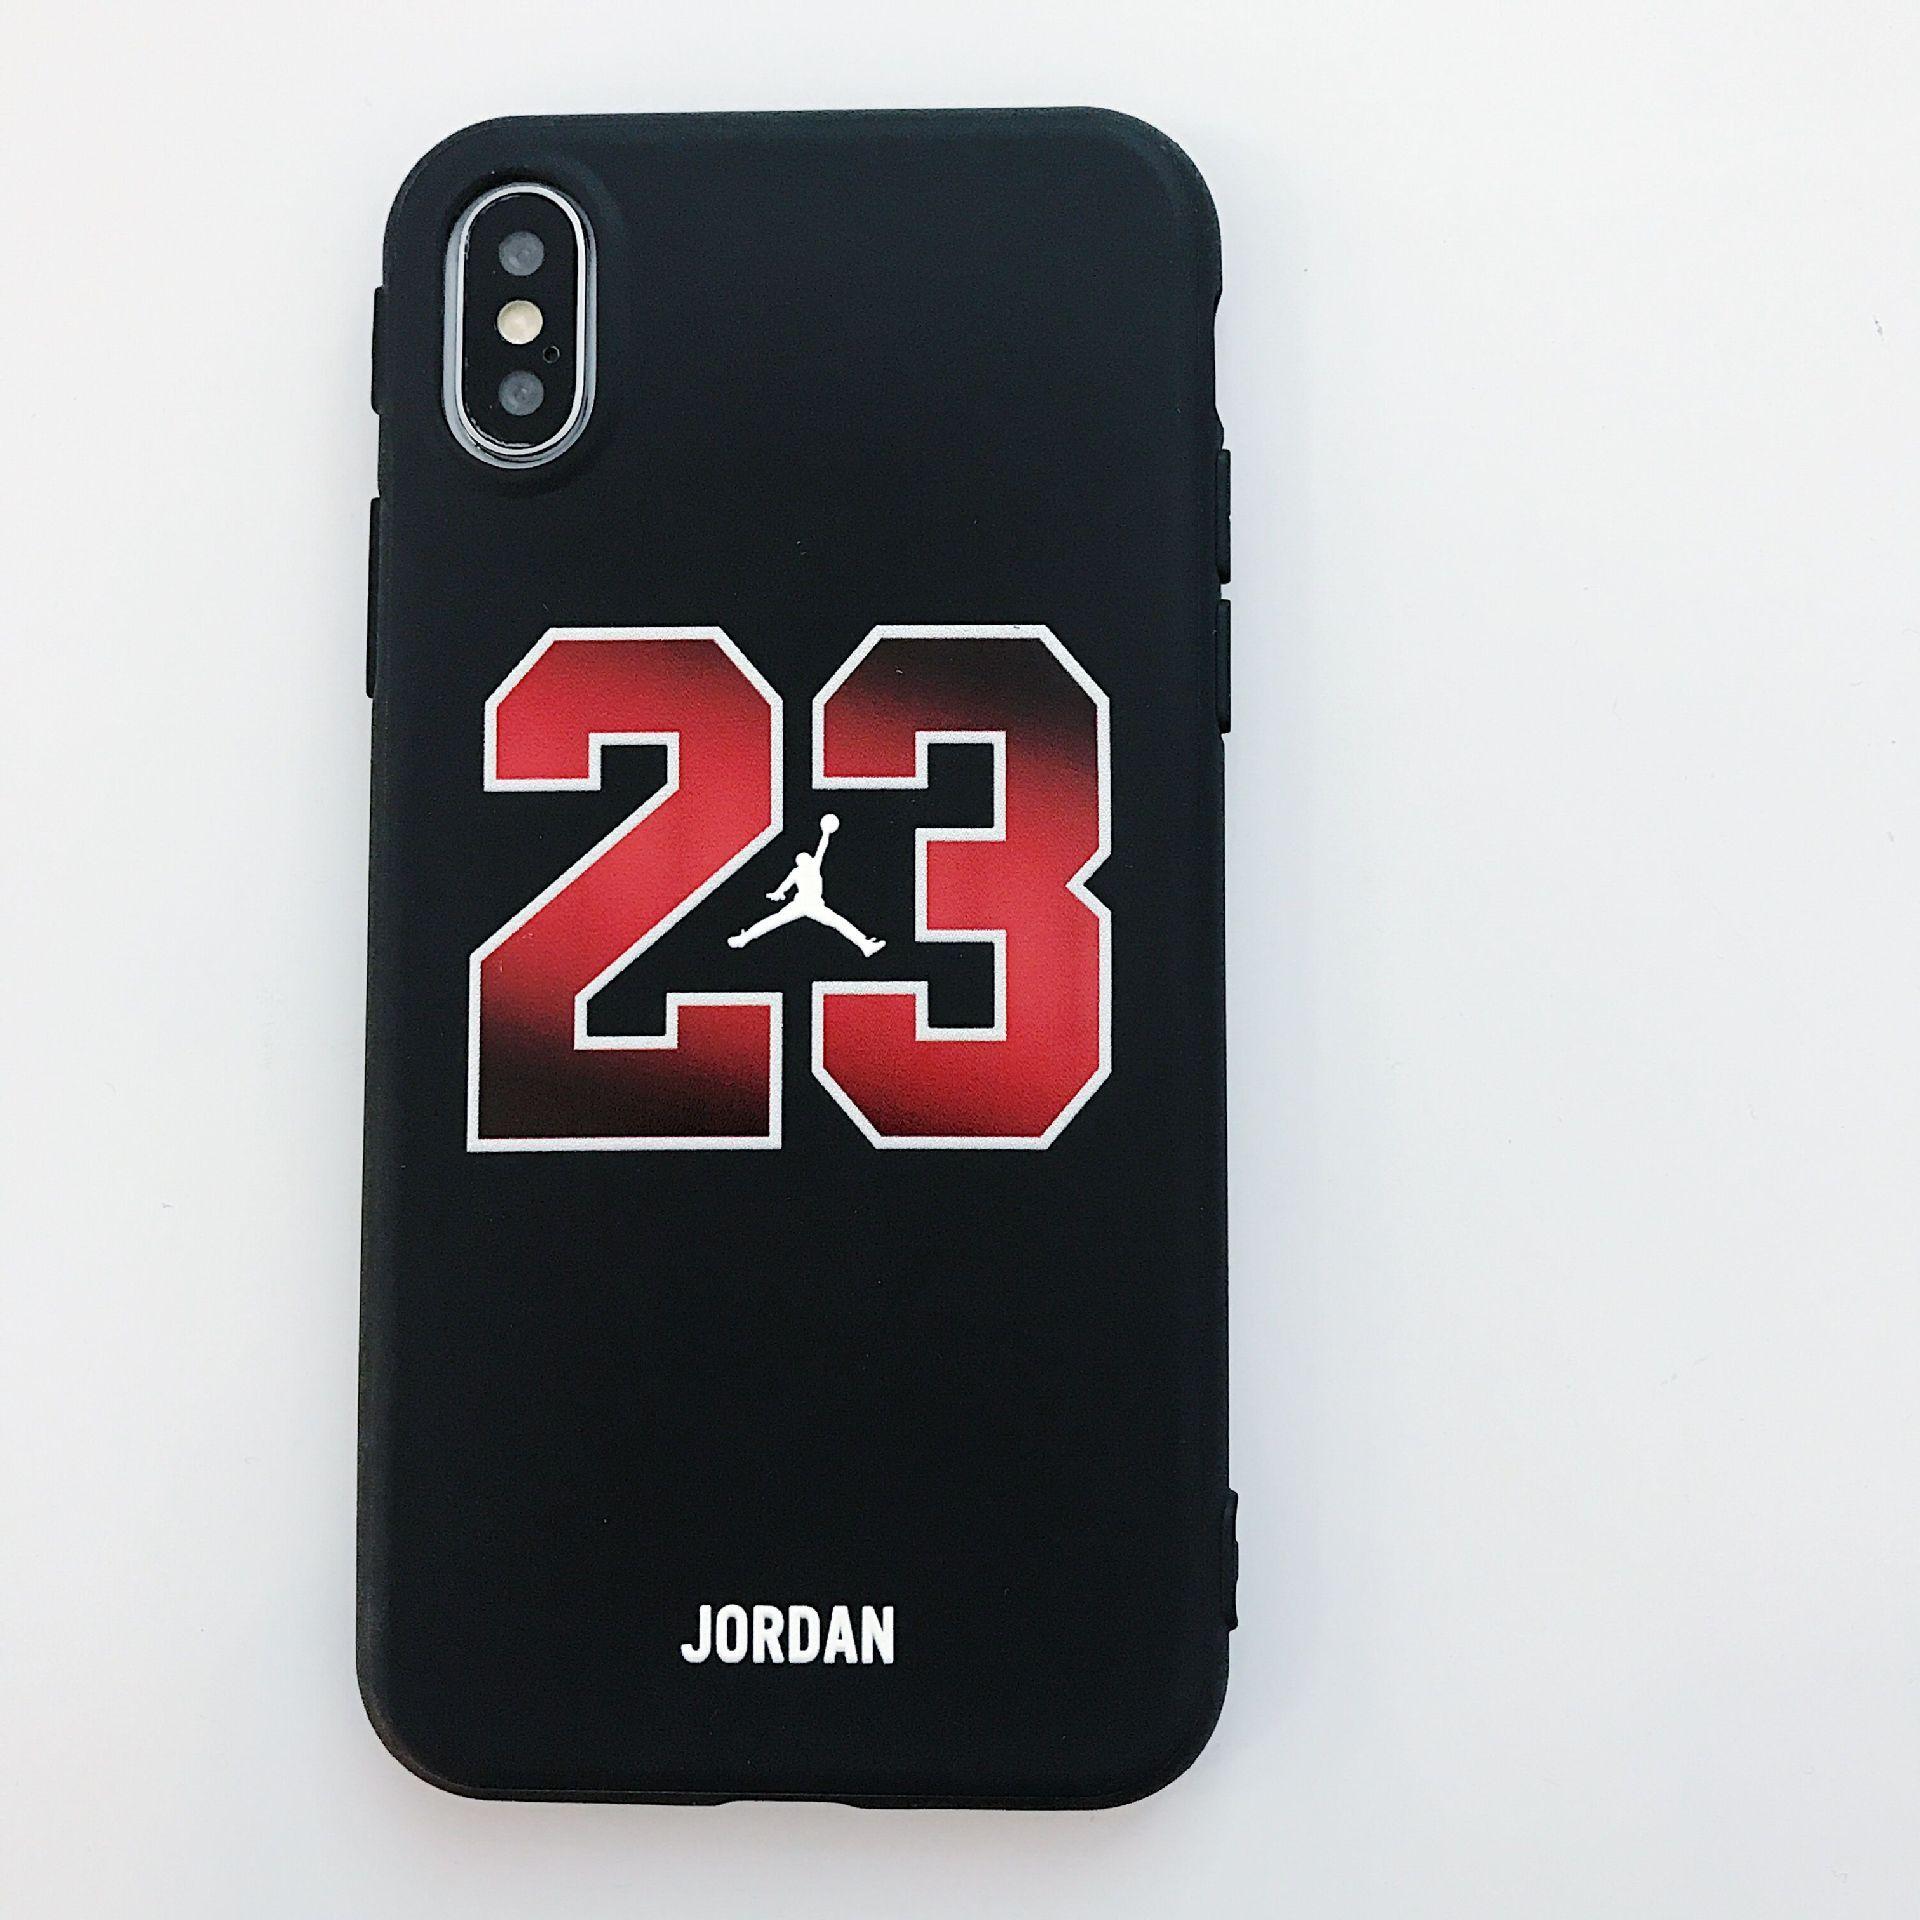 2018 jersey designer phone case for iphone x 6 6s 6plus 7 8 7plus2018 jersey designer phone case for iphone x 6 6s 6plus 7 8 7plus 8plus high street style hip hop brand case cover phone case with rope leather phone cases